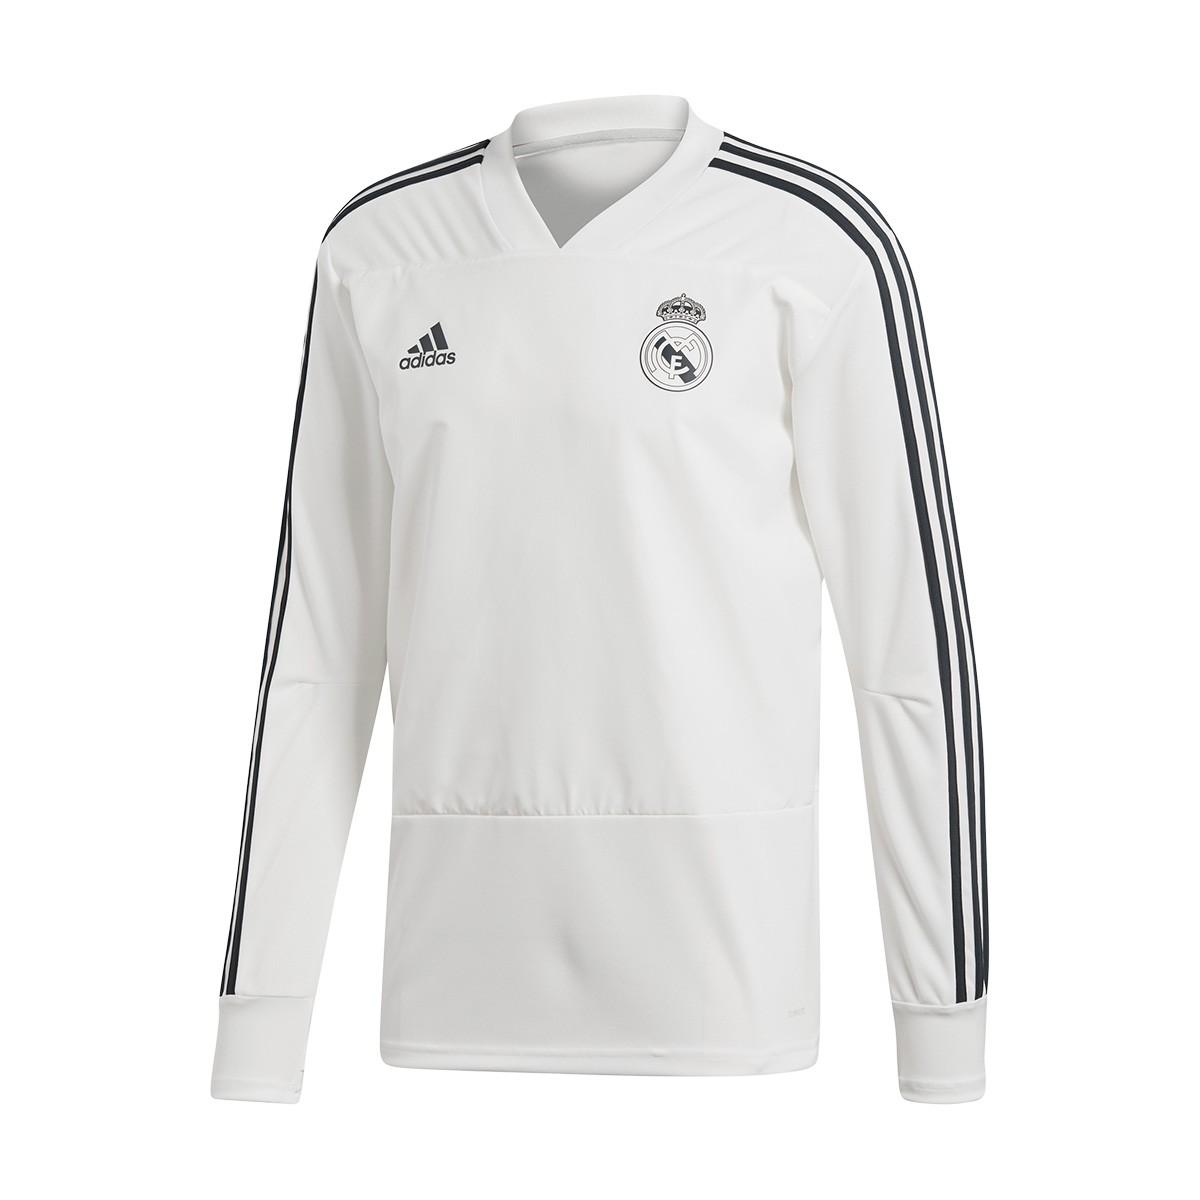 187edd5688881 Sudadera adidas Real Madrid Training 2018-2019 White-Tech onix - Tienda de  fútbol Fútbol Emotion